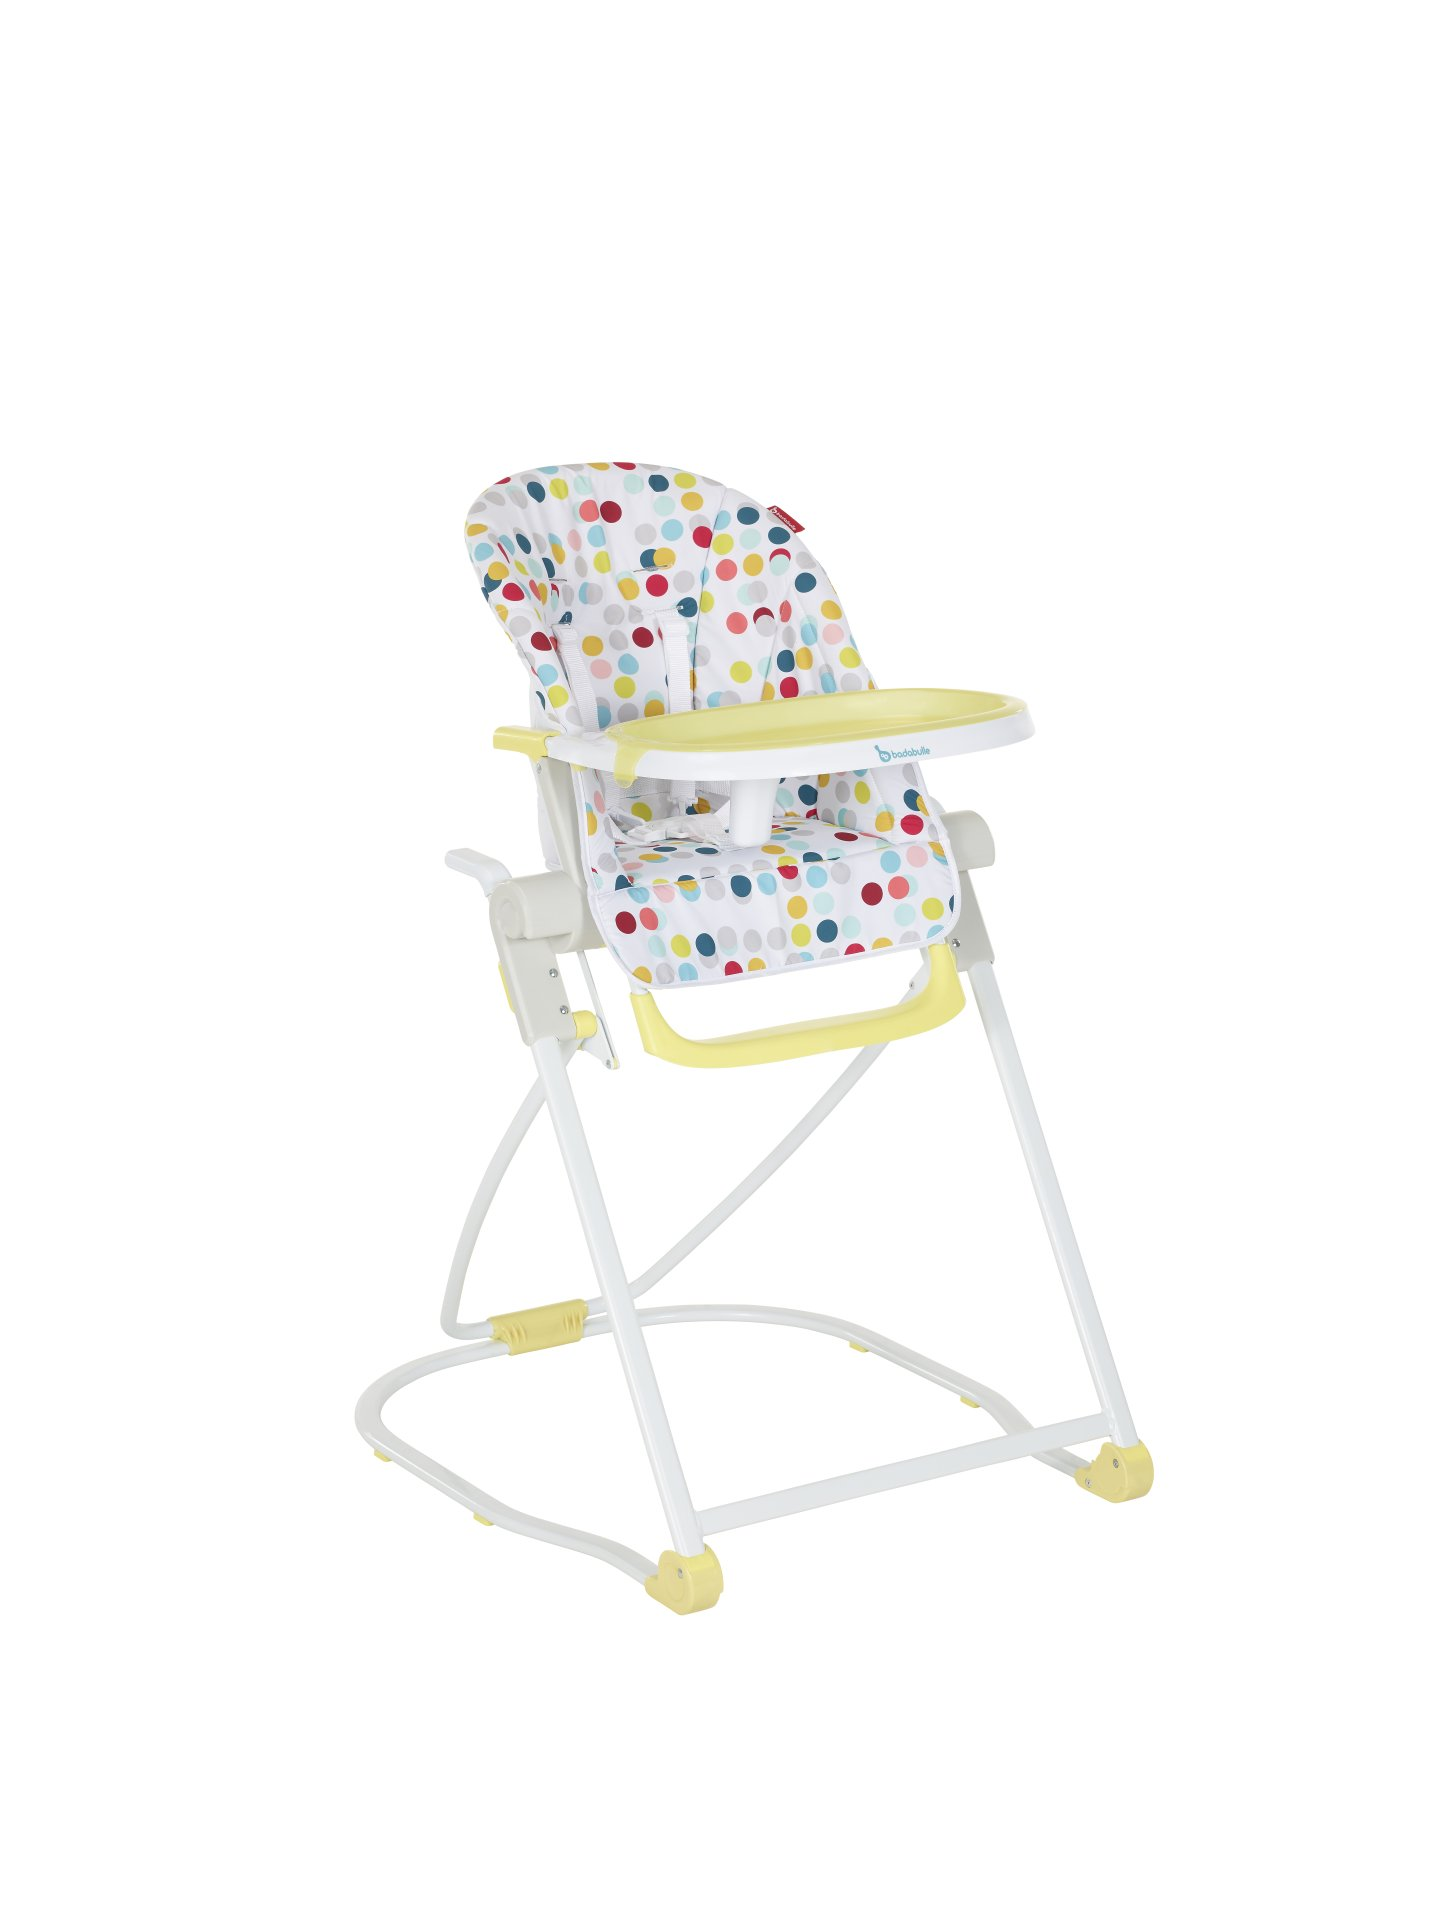 Image De 2018 Yellow Taille Grande Highchair Badabulle Compact Confetti RYaaXq